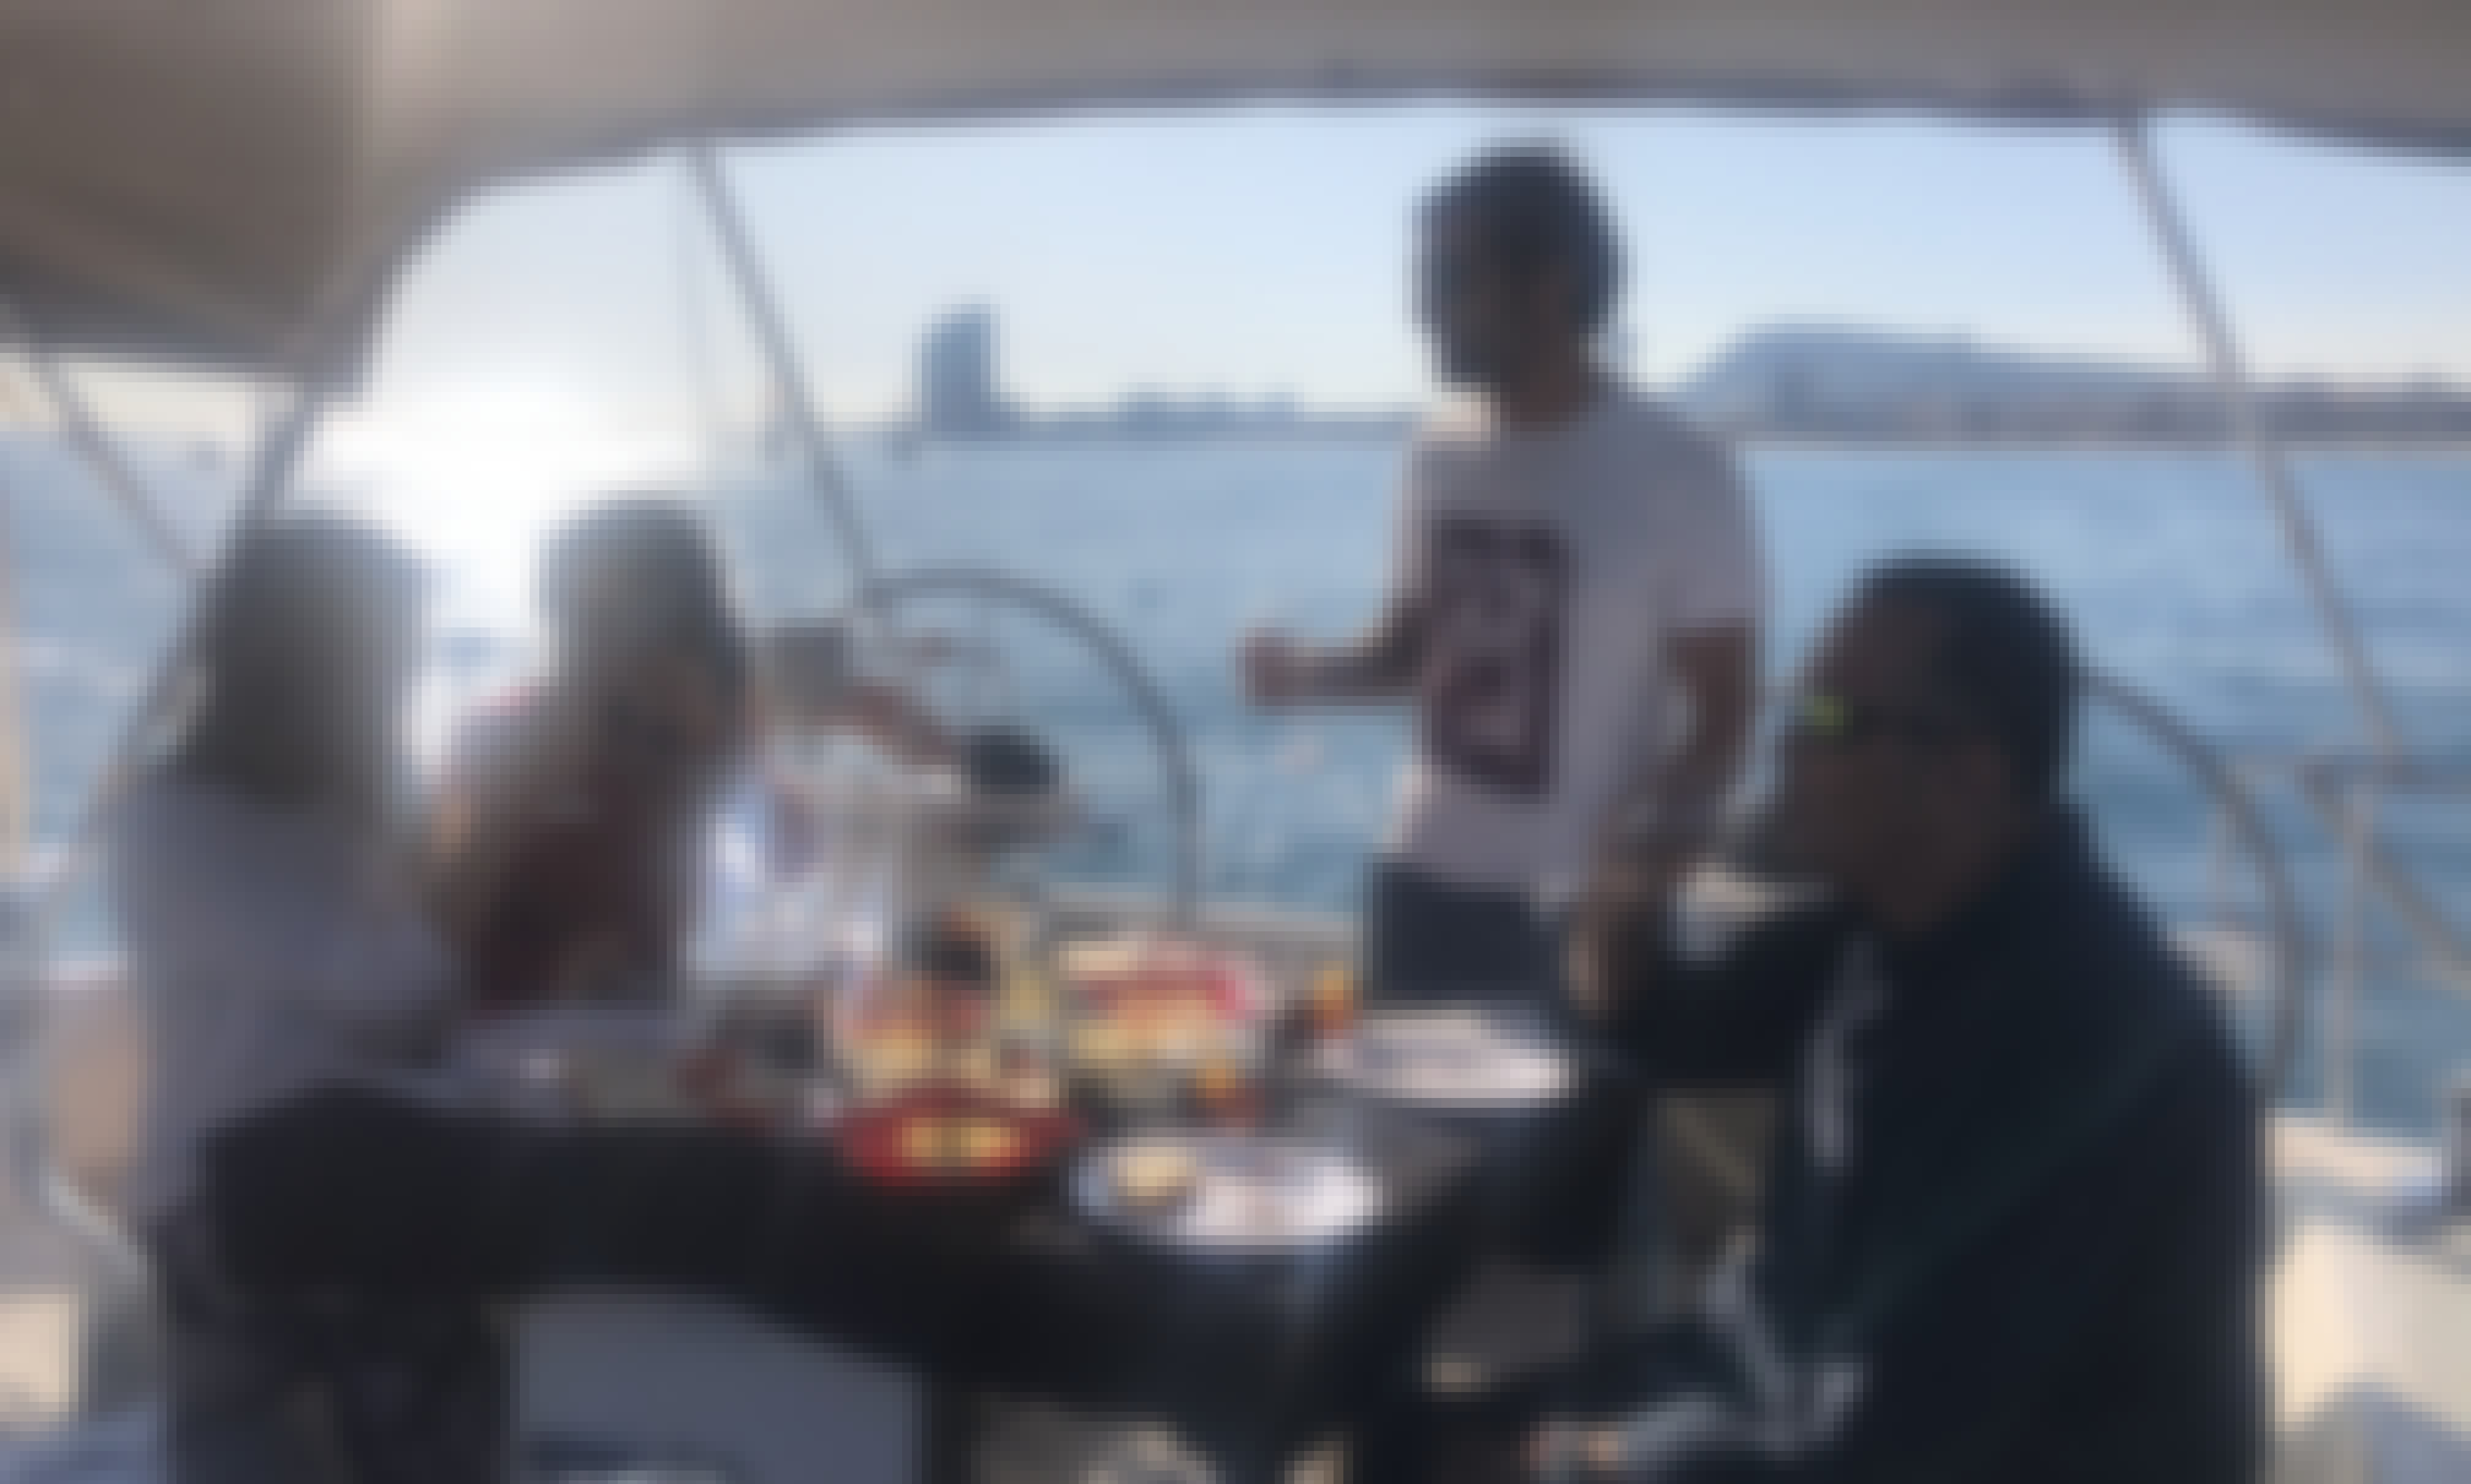 Enjoy this Barcelona Sailing Tapas Trip With Us!